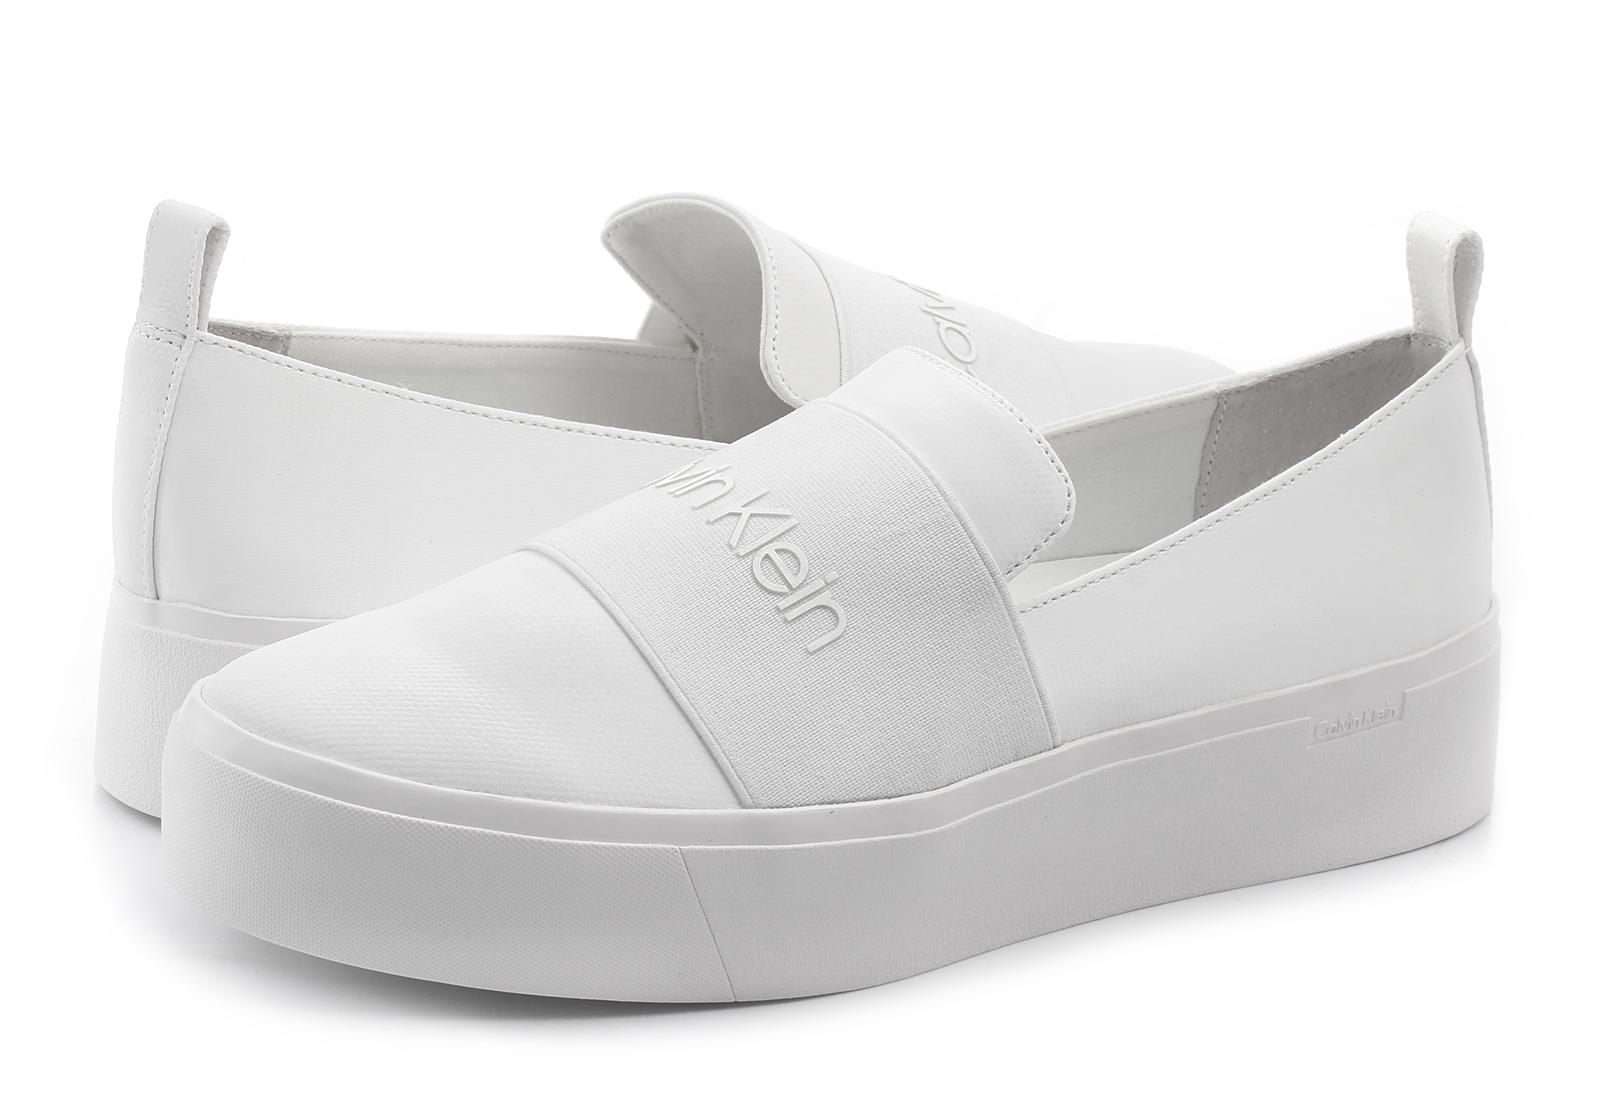 Calvin Klein Black Label Shoes Jacinta